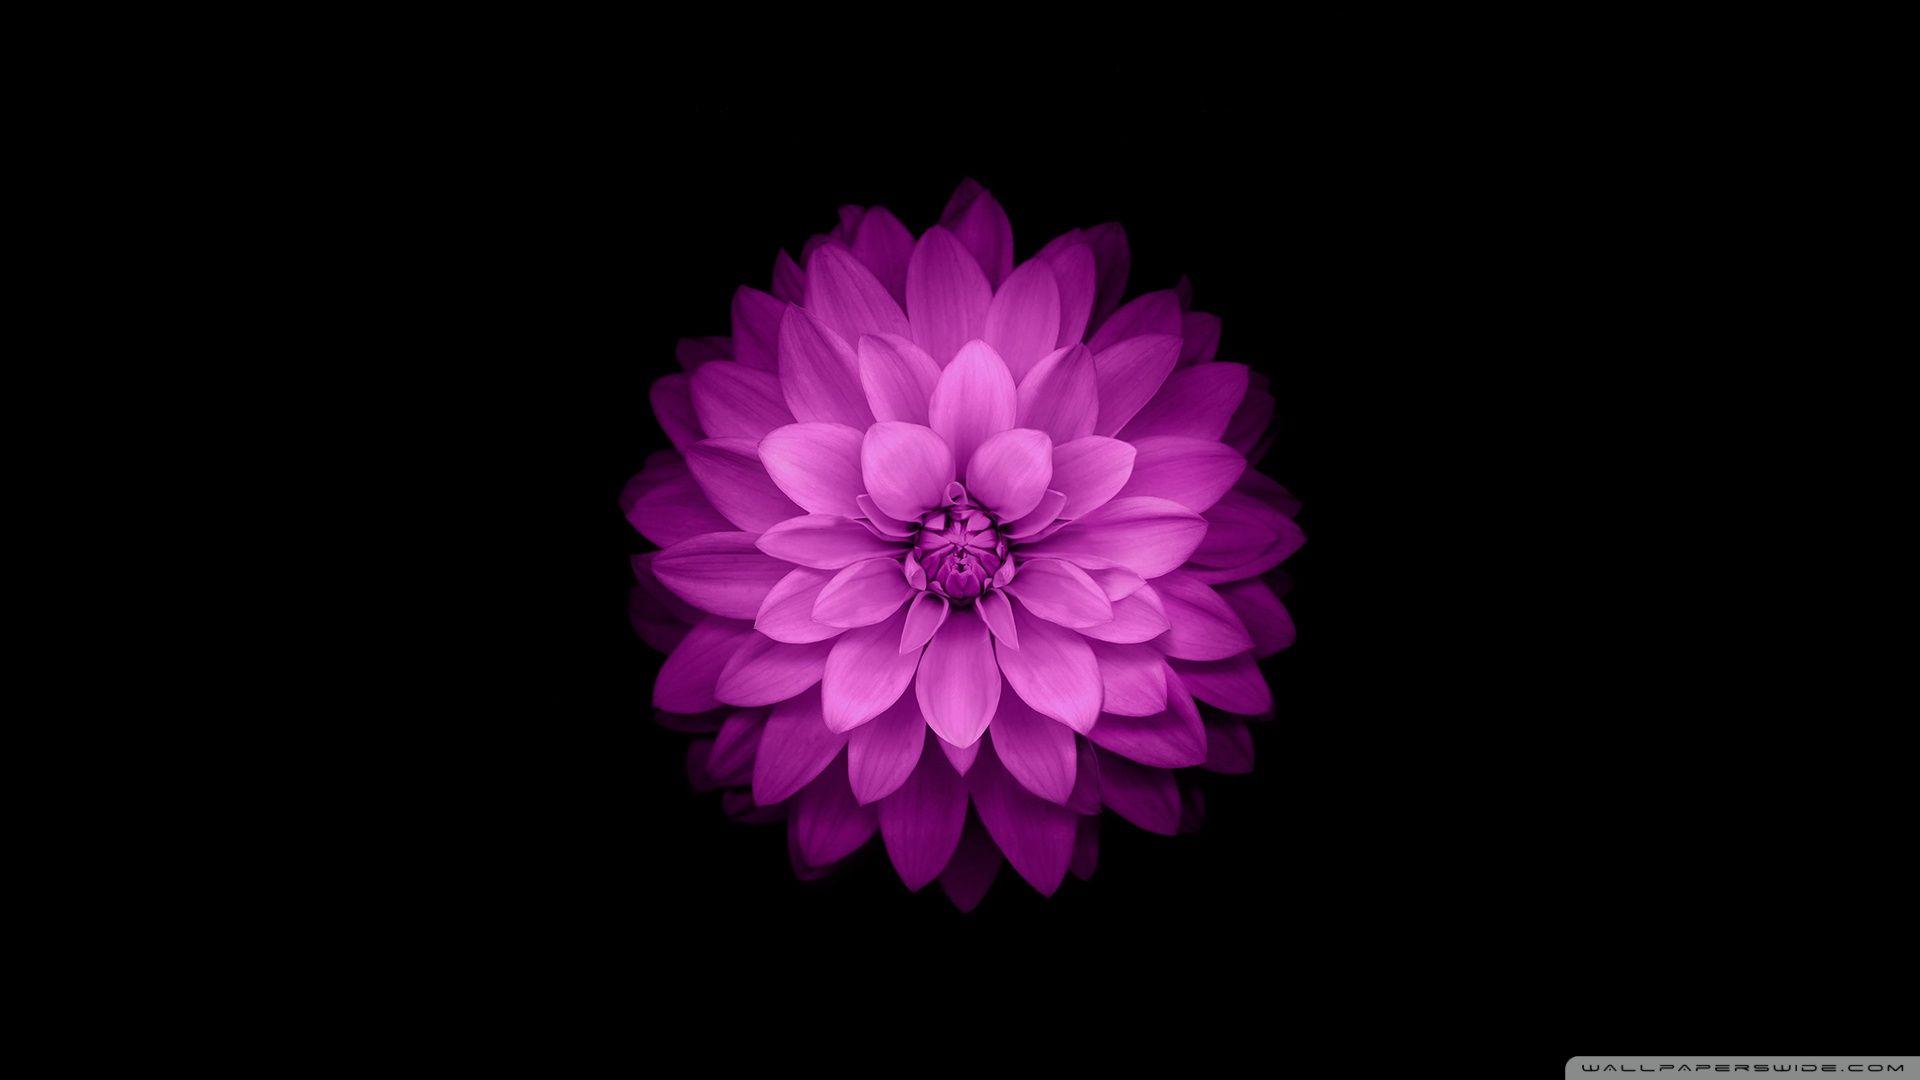 Pin By One Heart Soul On Wallpaper Flower Iphone Wallpaper